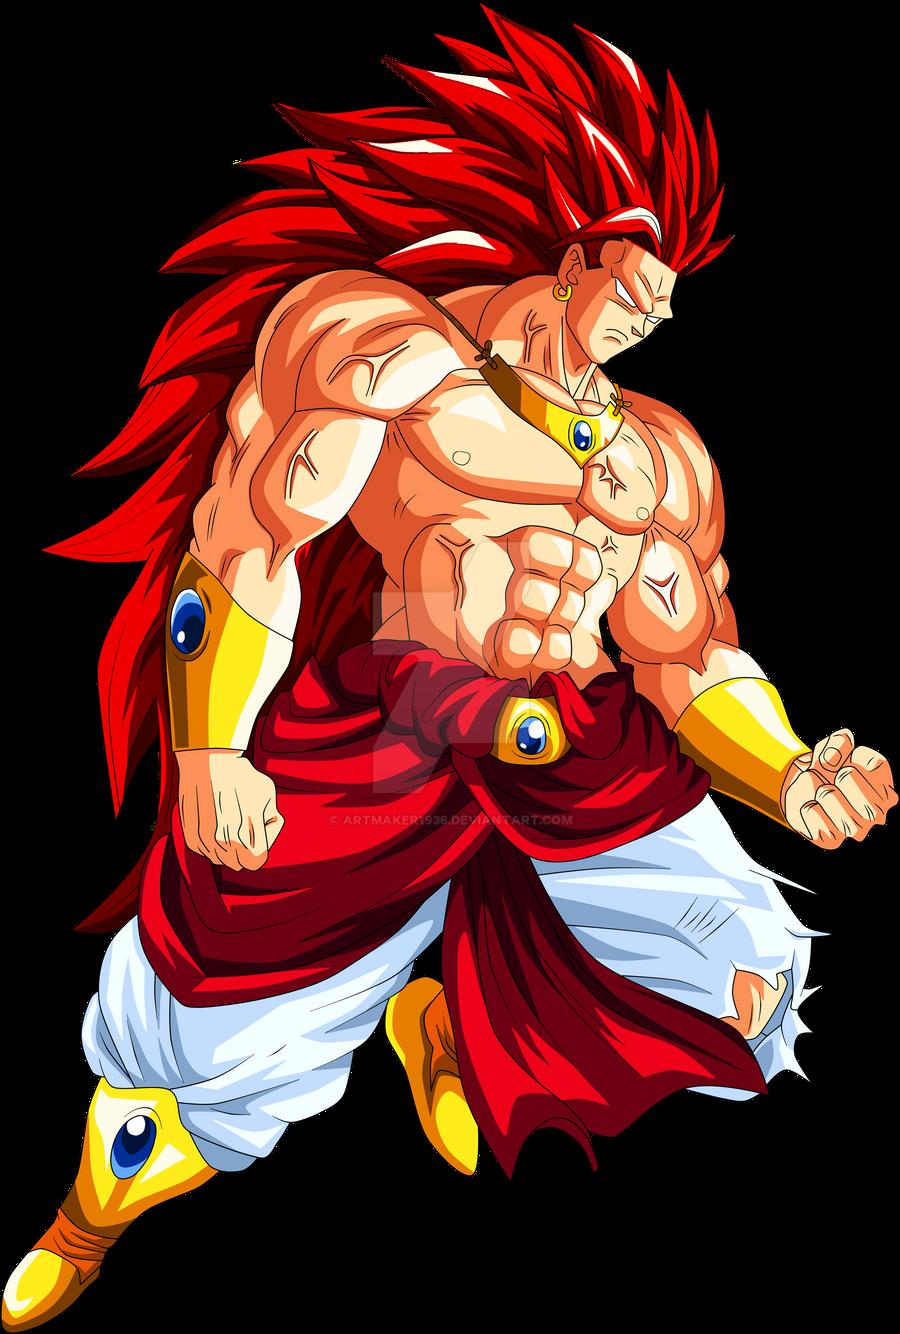 Dbz Broly Super Saiyan God | www.imgkid.com - The Image ...